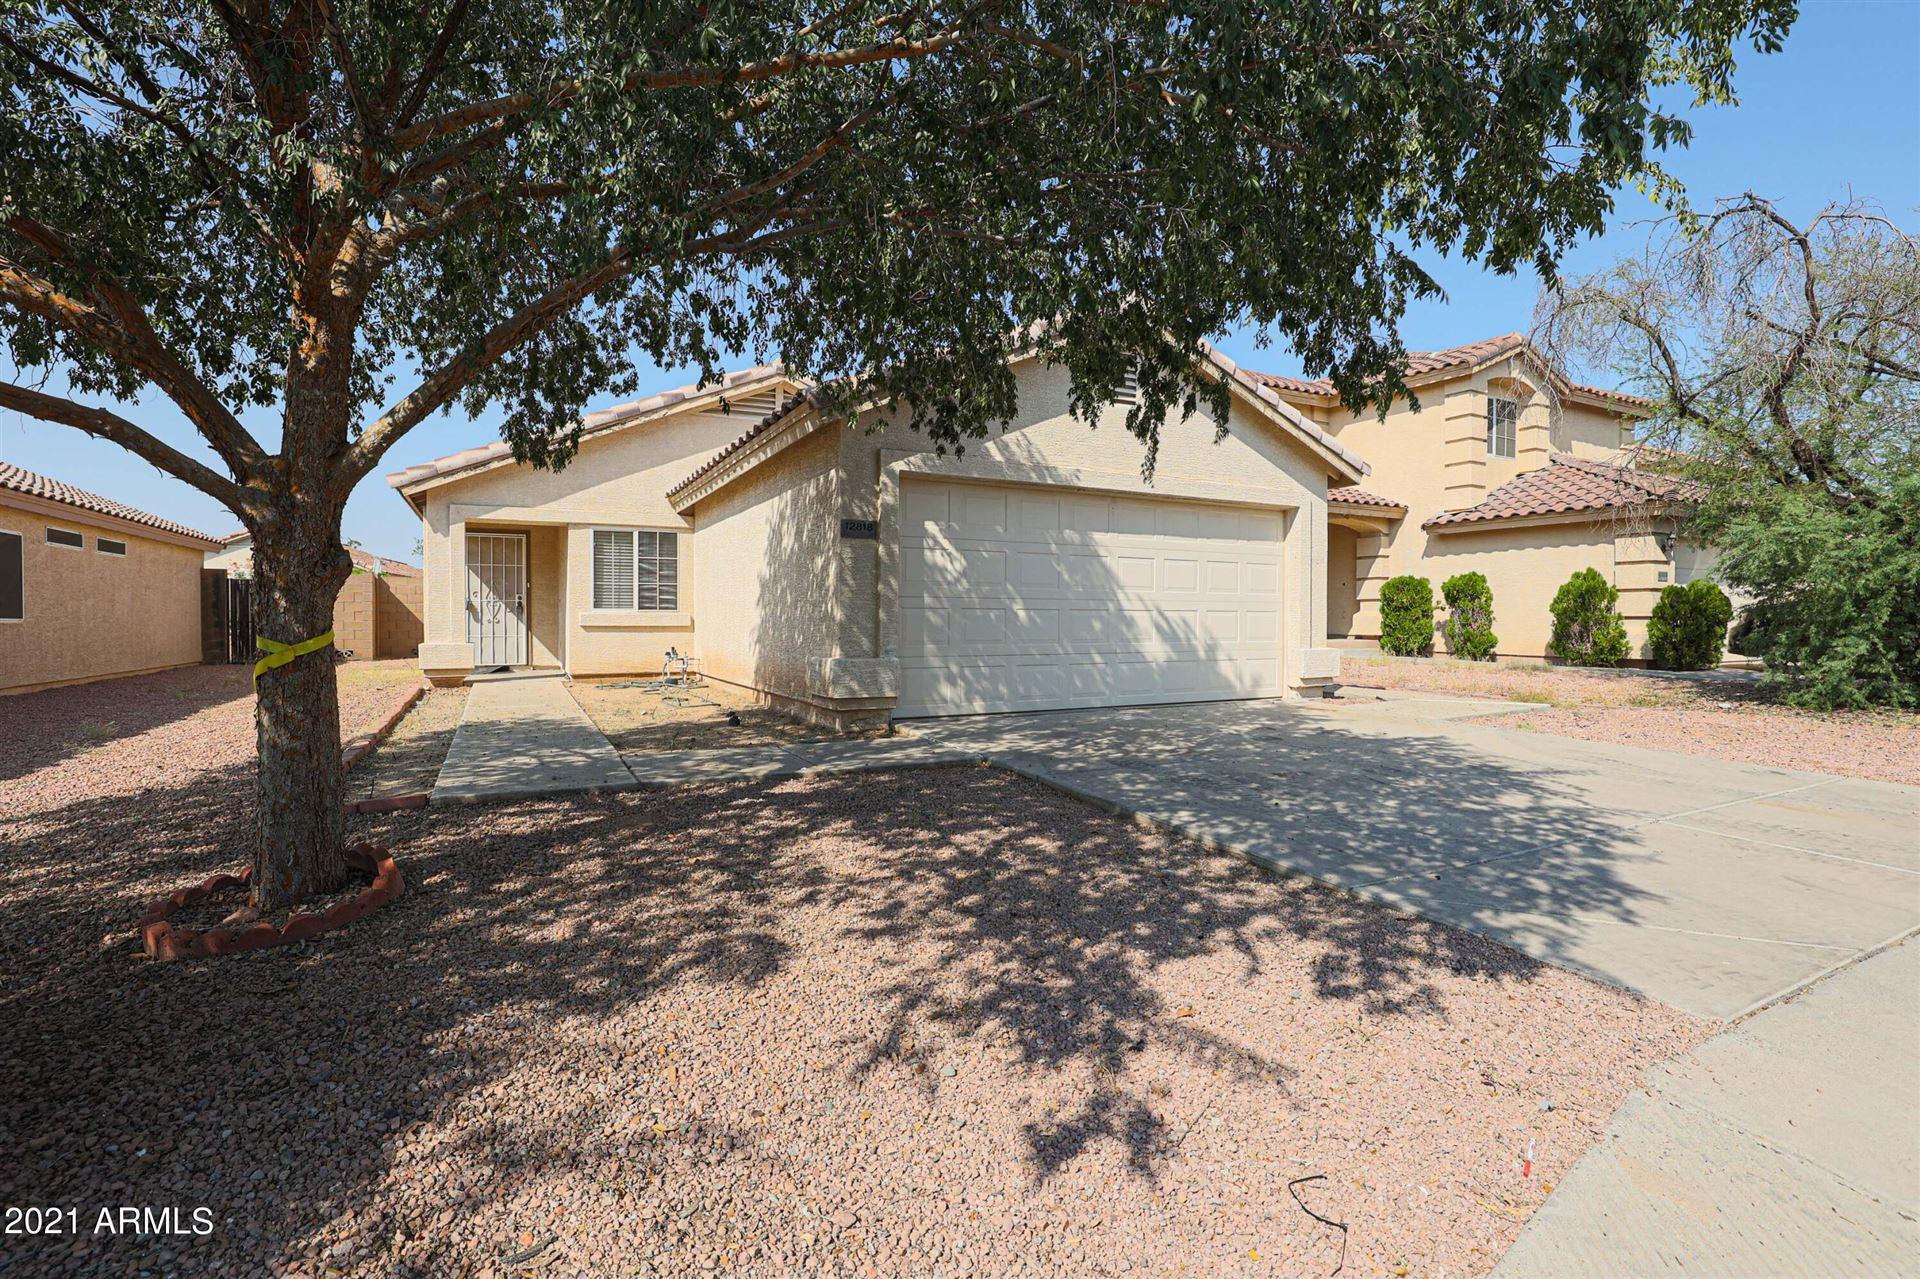 Photo of 12818 N PALM Street, El Mirage, AZ 85335 (MLS # 6293948)